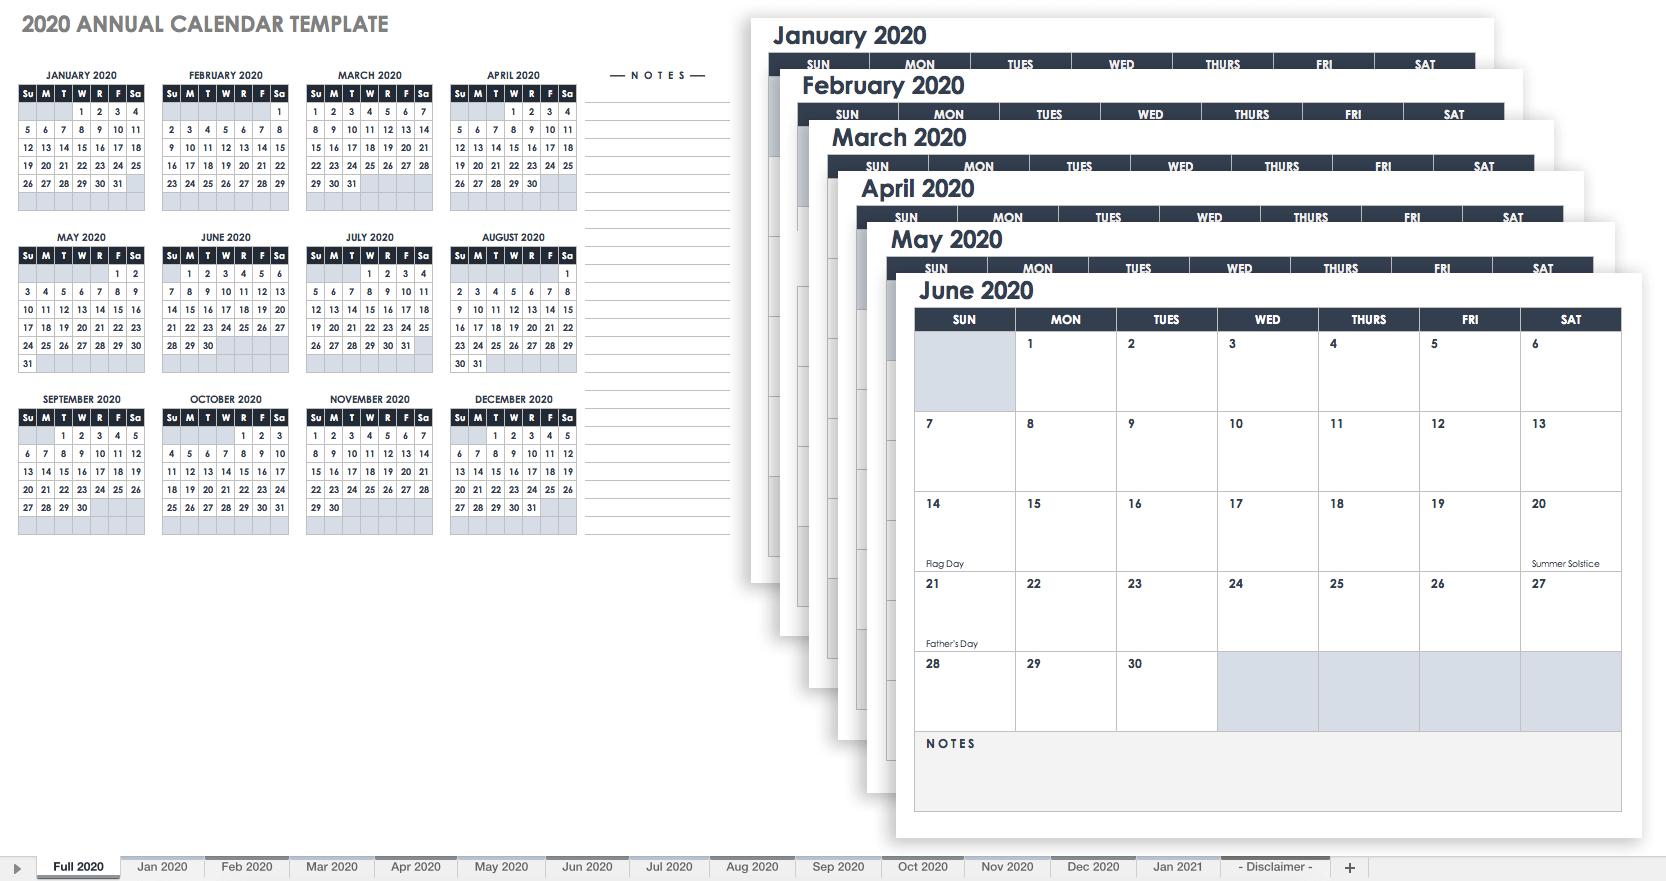 15 Free Monthly Calendar Templates | Smartsheet with regard to Free Excel Calendar Templates